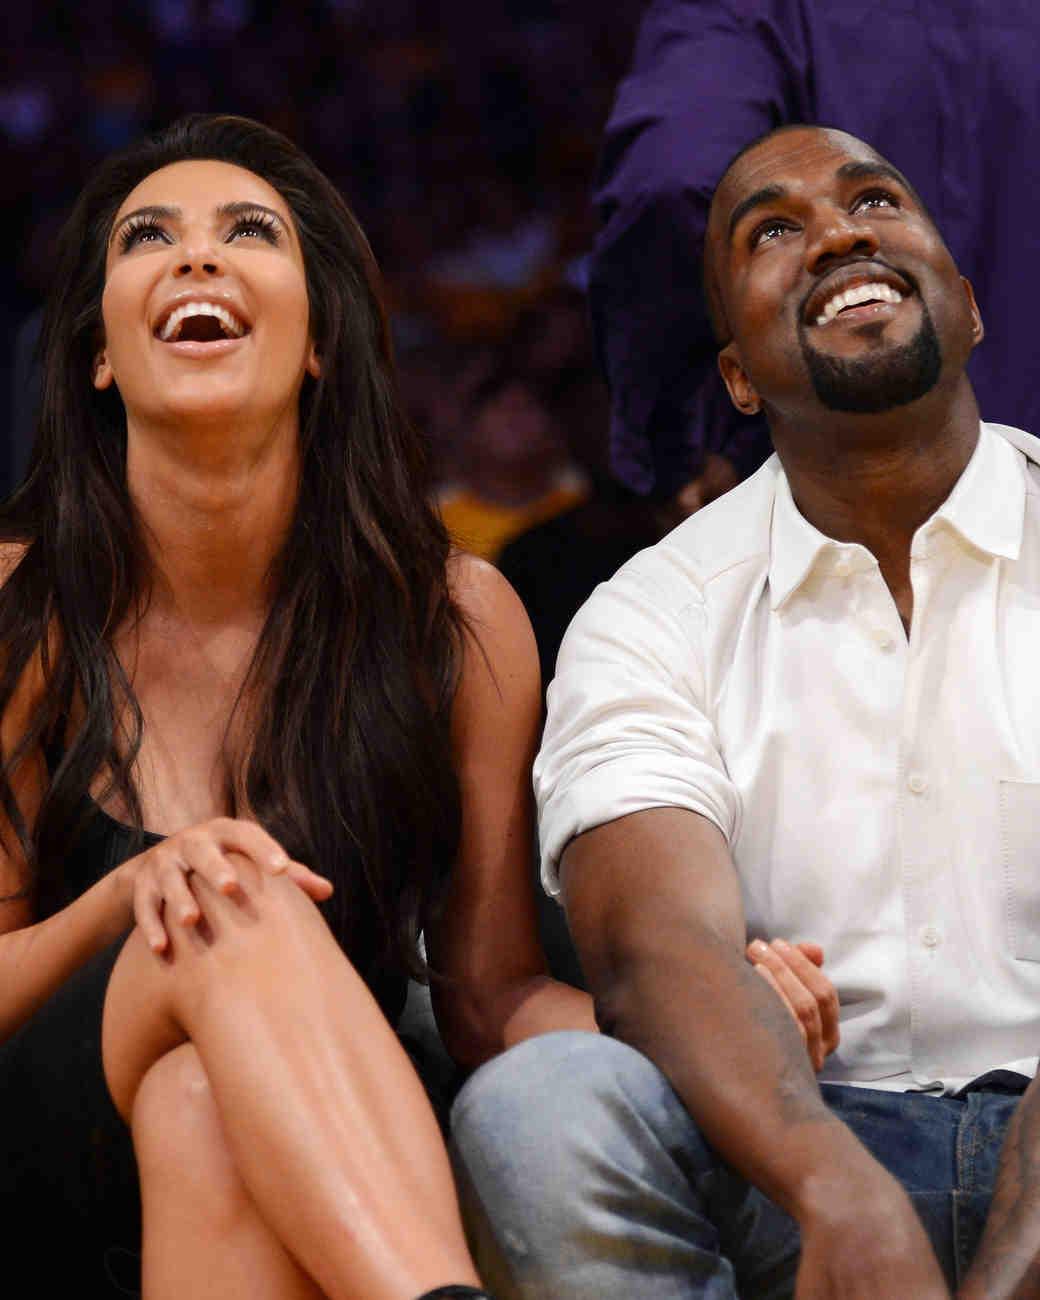 celebs-courtside-kim-kardashian-kanye-west-0616.jpg